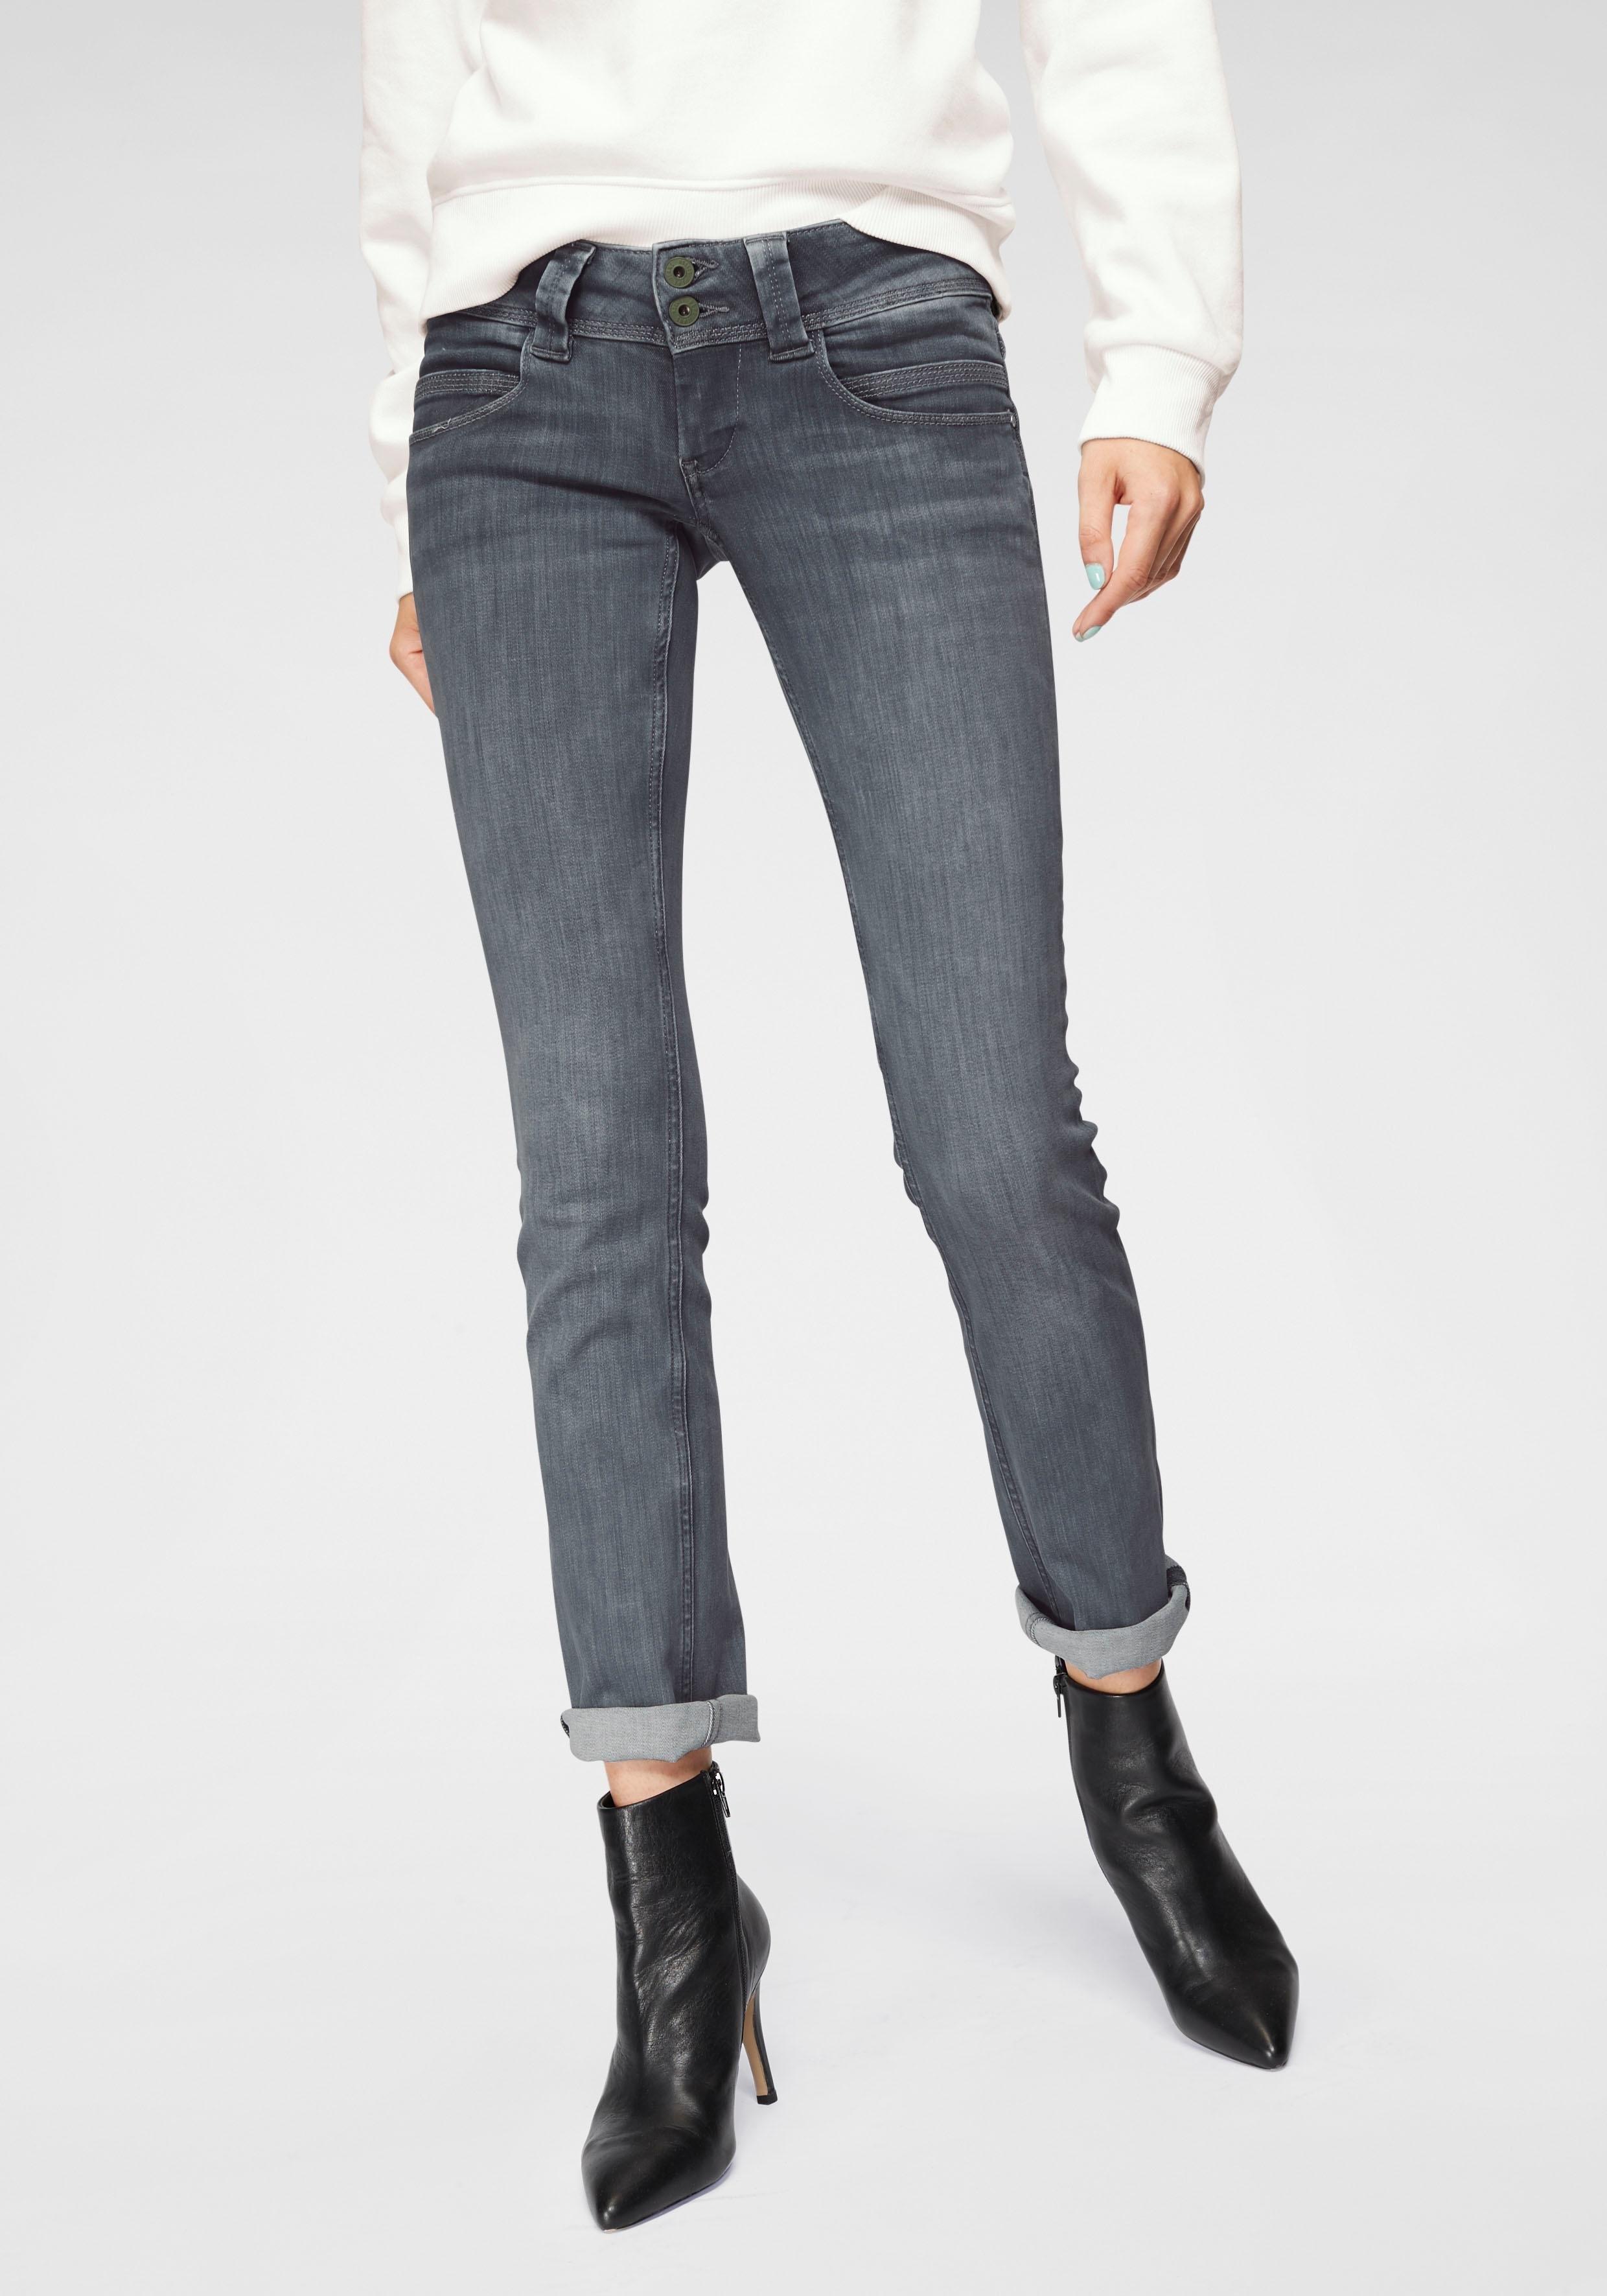 Jeansvenus Online Bij Jeans Straight Pepe wX80OknP